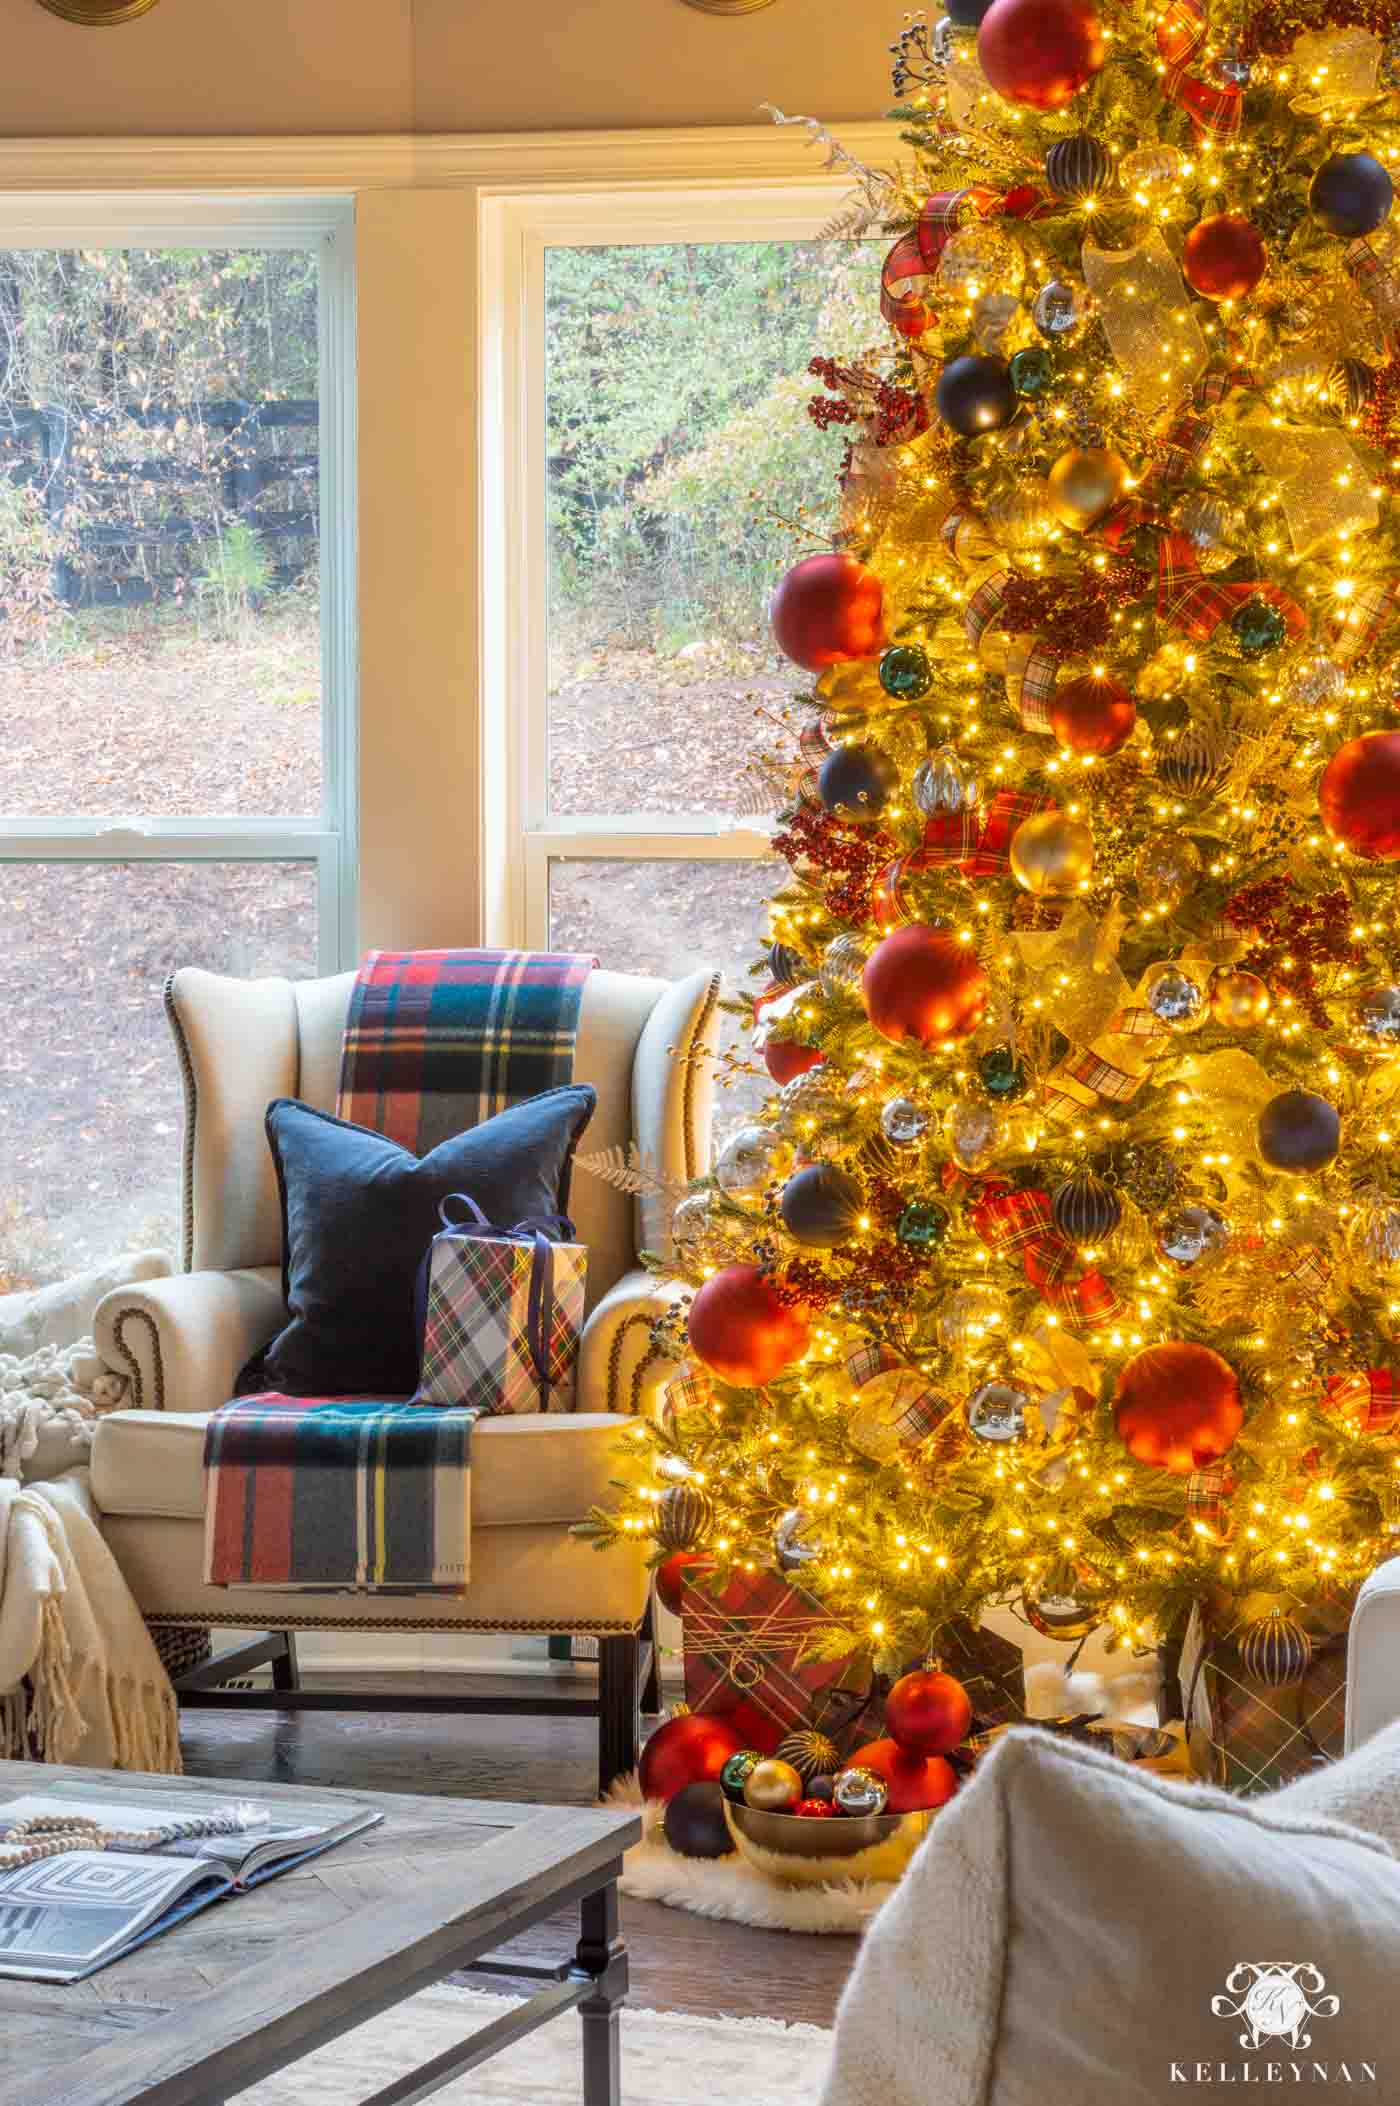 Red and Navy Tartan Christmas Tree